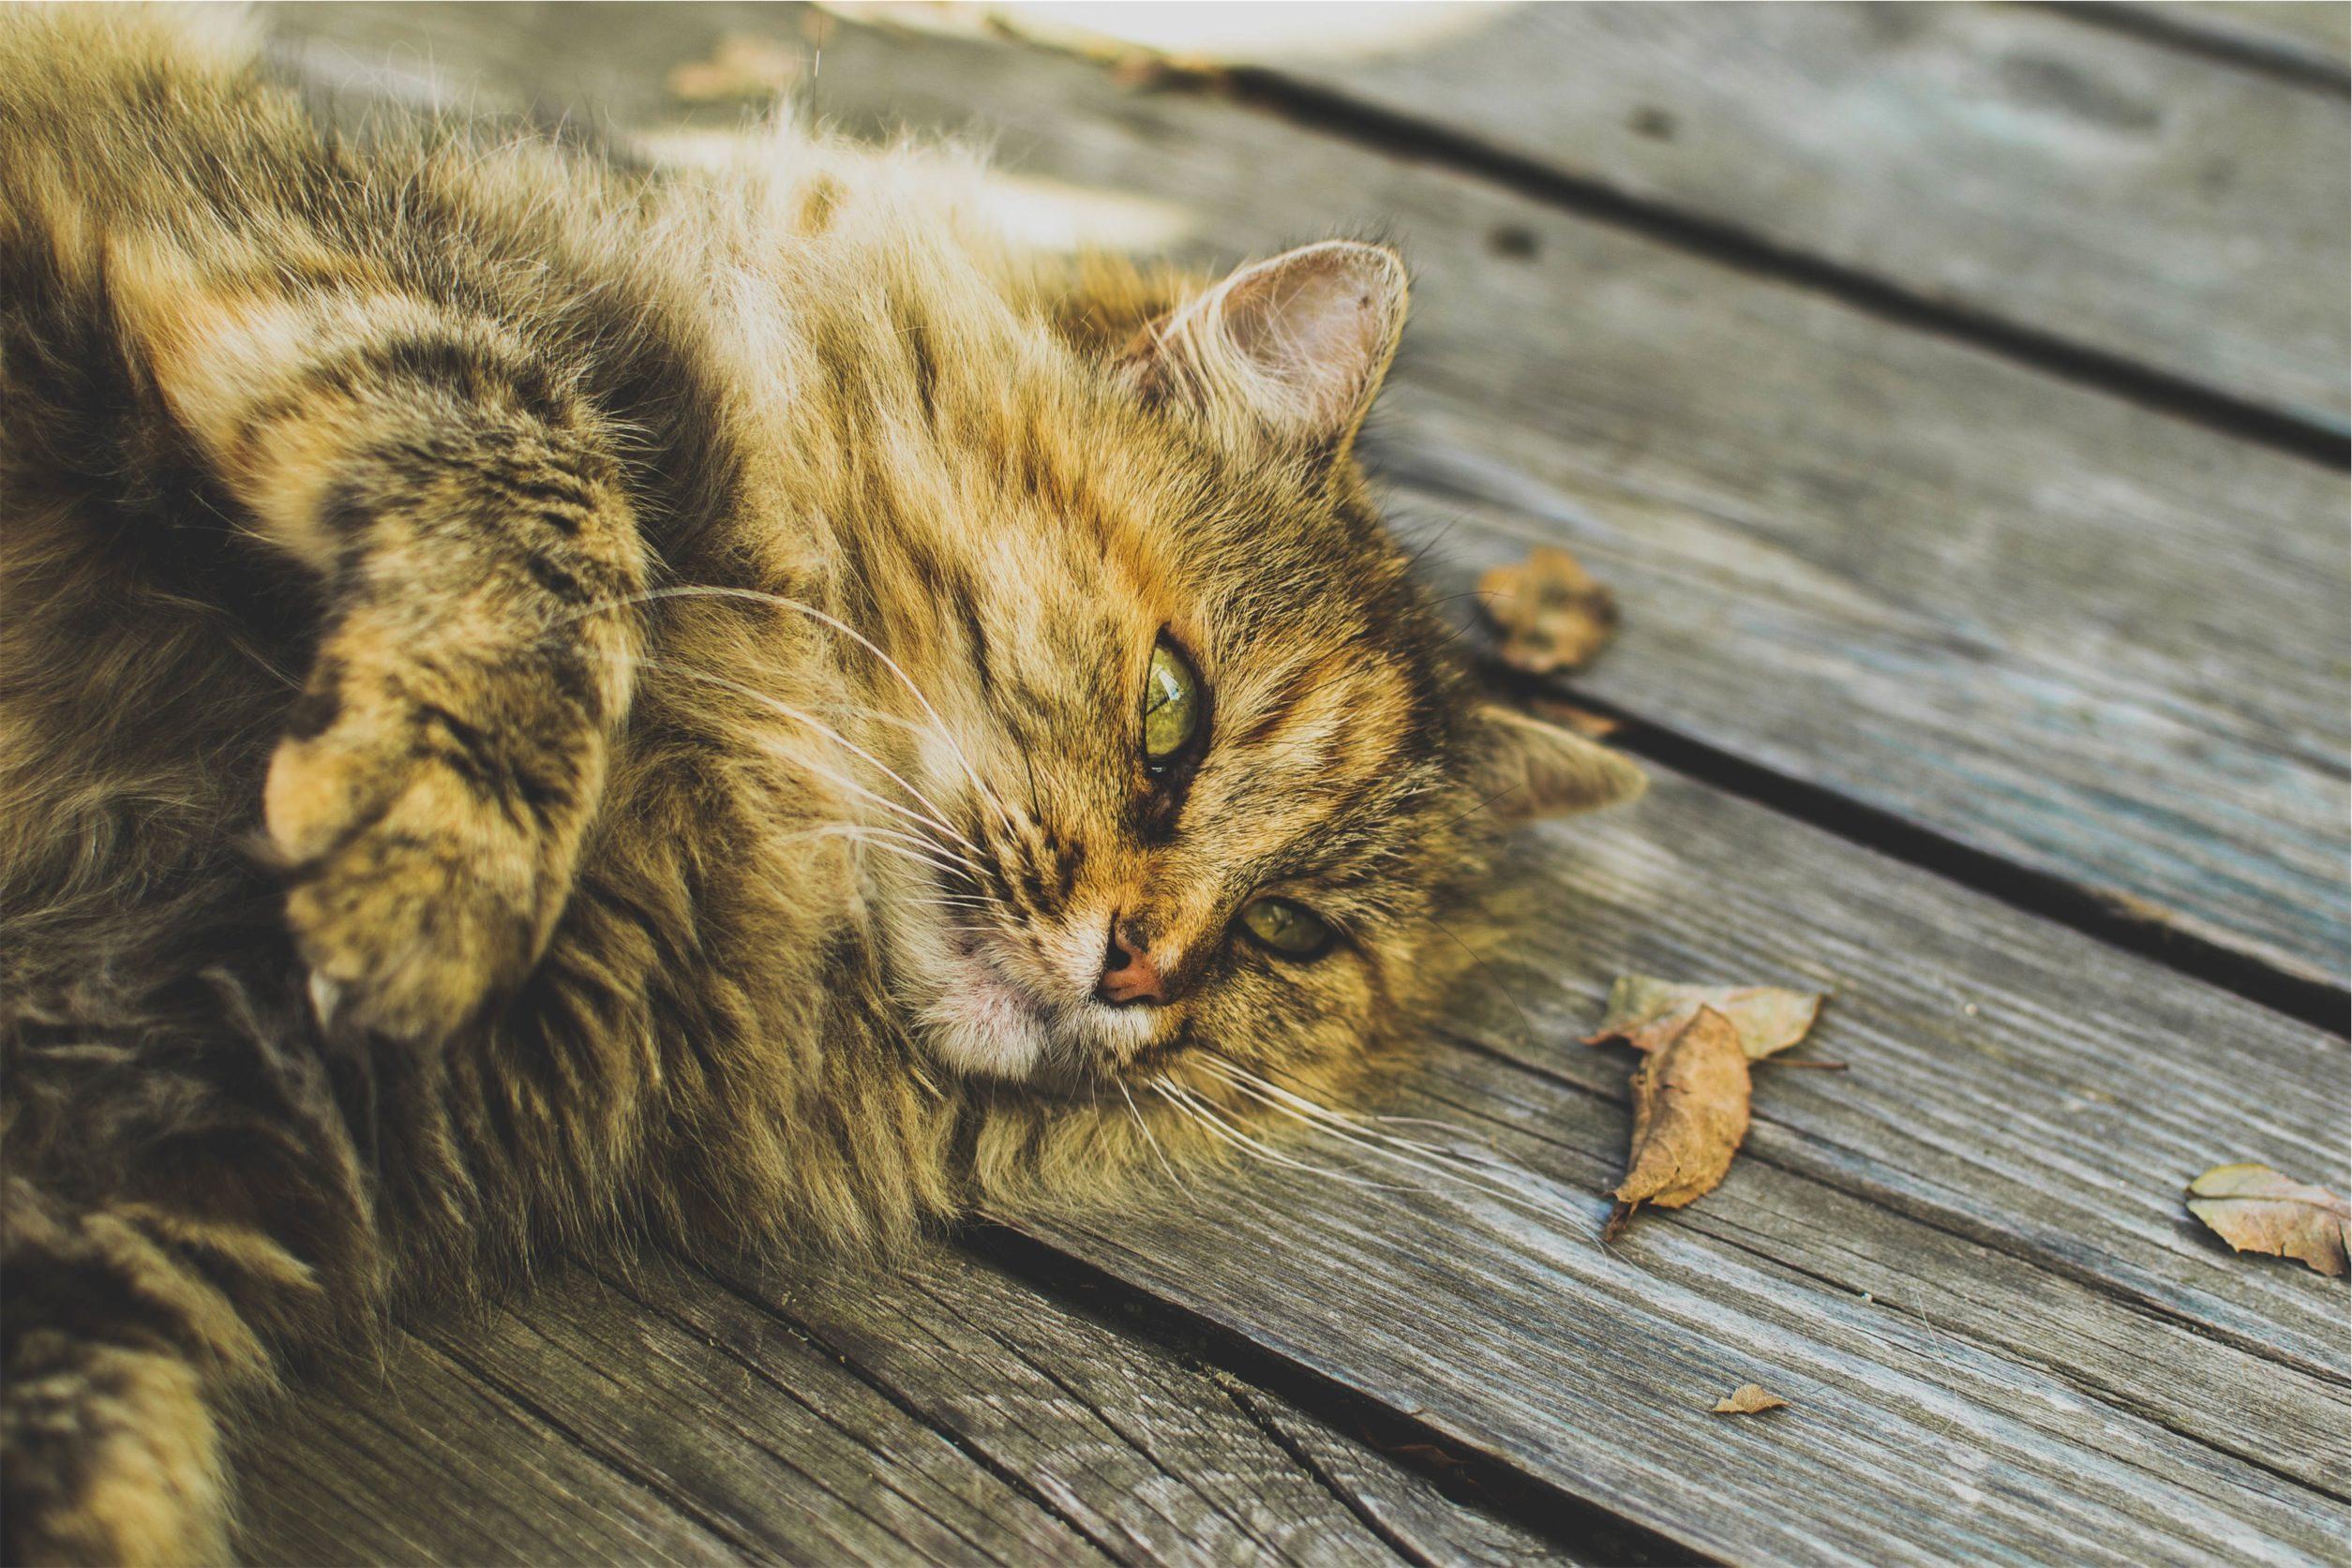 gato, Relaxe, solo, madeira, Olha - Papéis de parede HD - Professor-falken.com